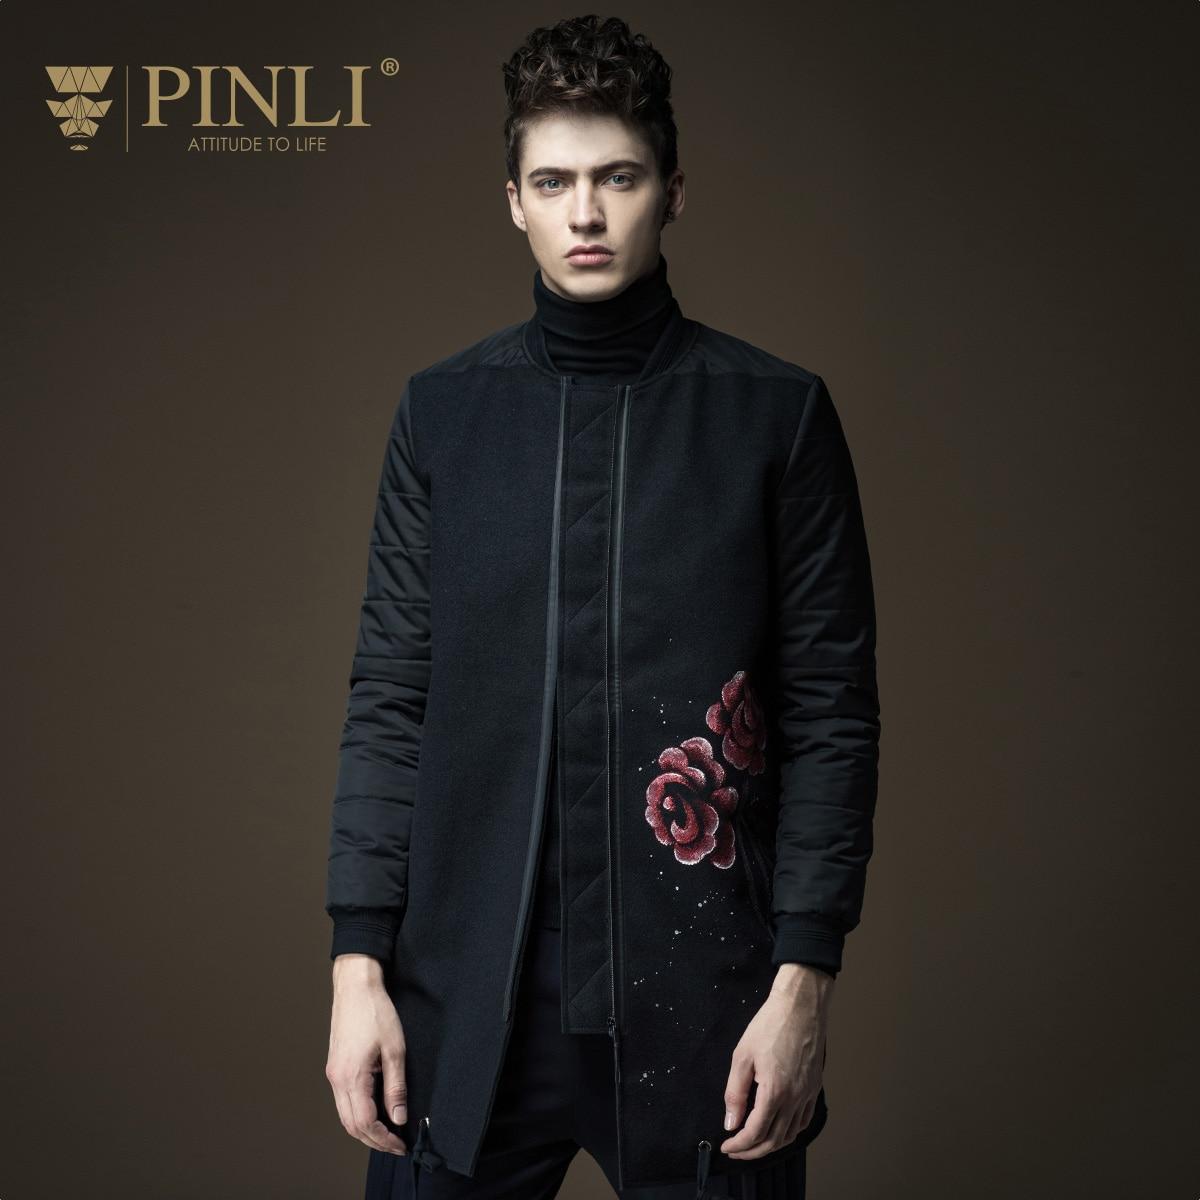 Winter Jackets Mens Winter Men New Arrival Acetate Regular Cotton Pinli Autumn Fashion Coat Jacket Zipper Male Boom D163505304